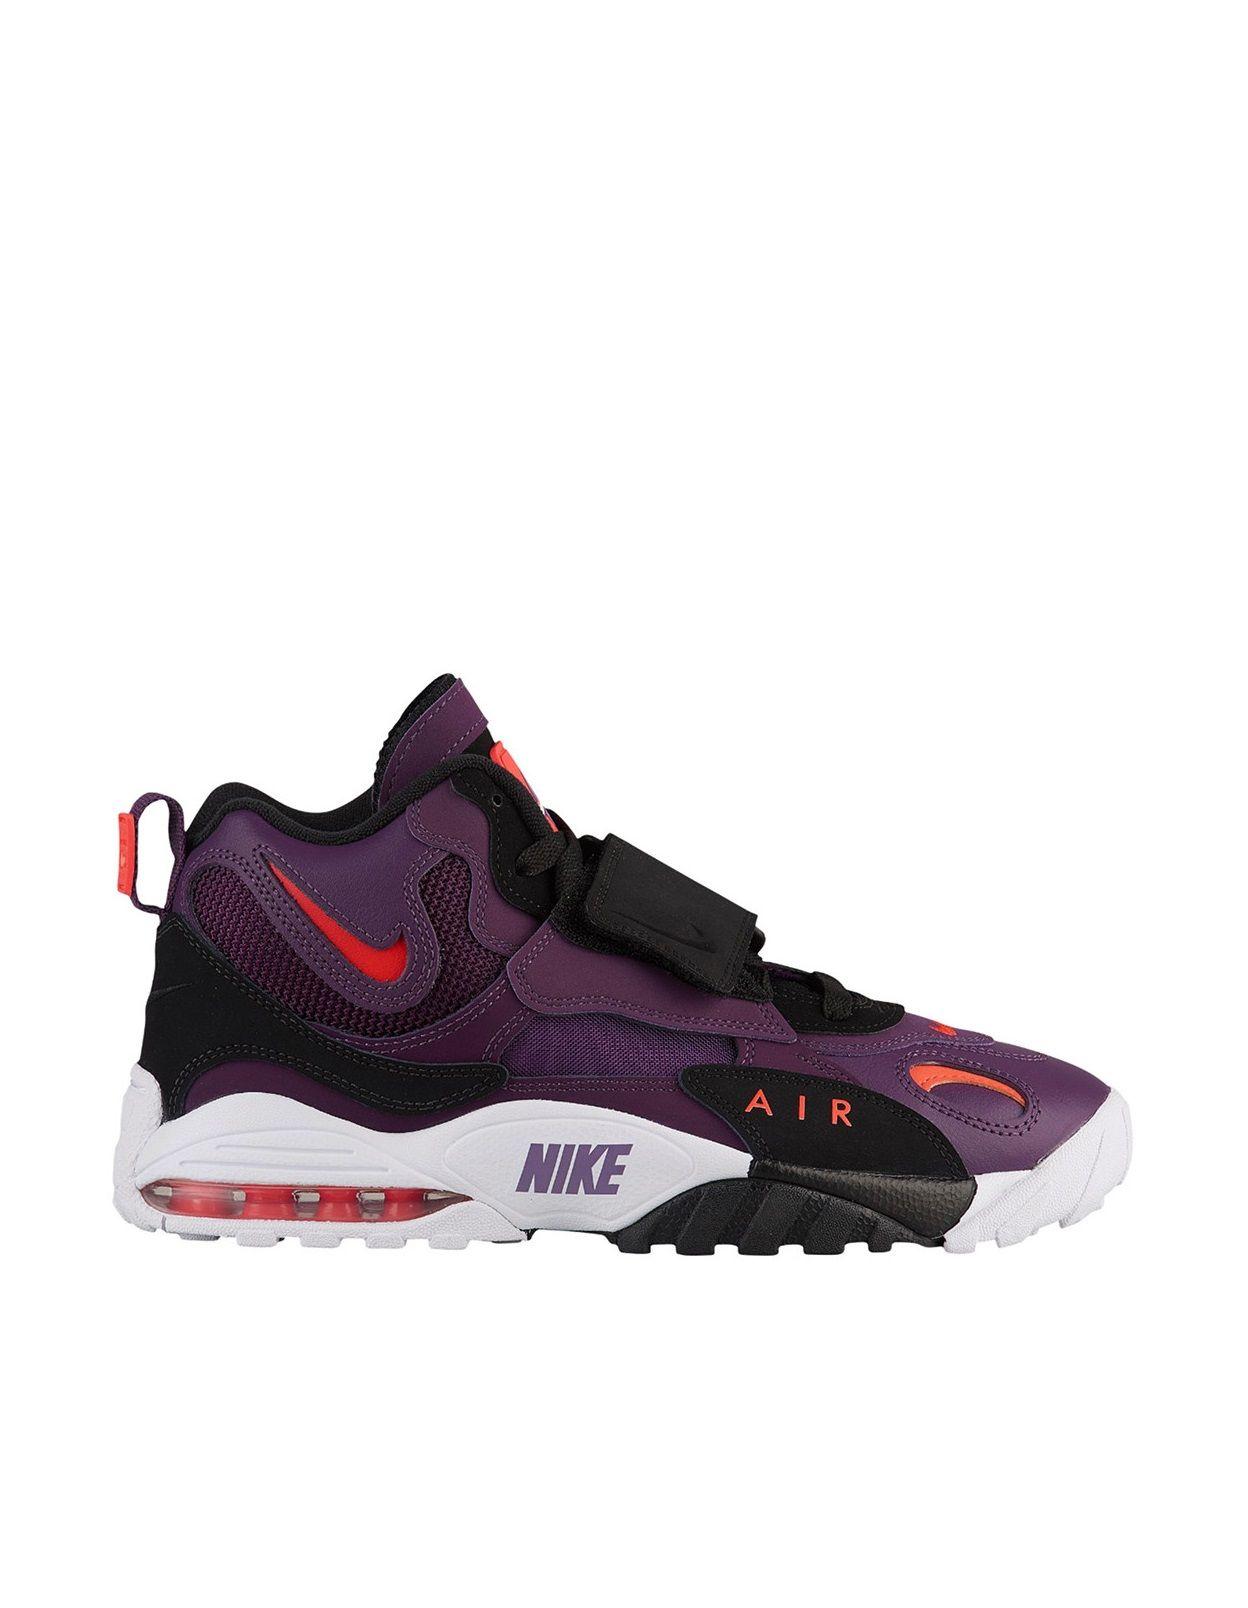 c262f7540 amazon nike air speed turf womens purple orange 7a777 fddad